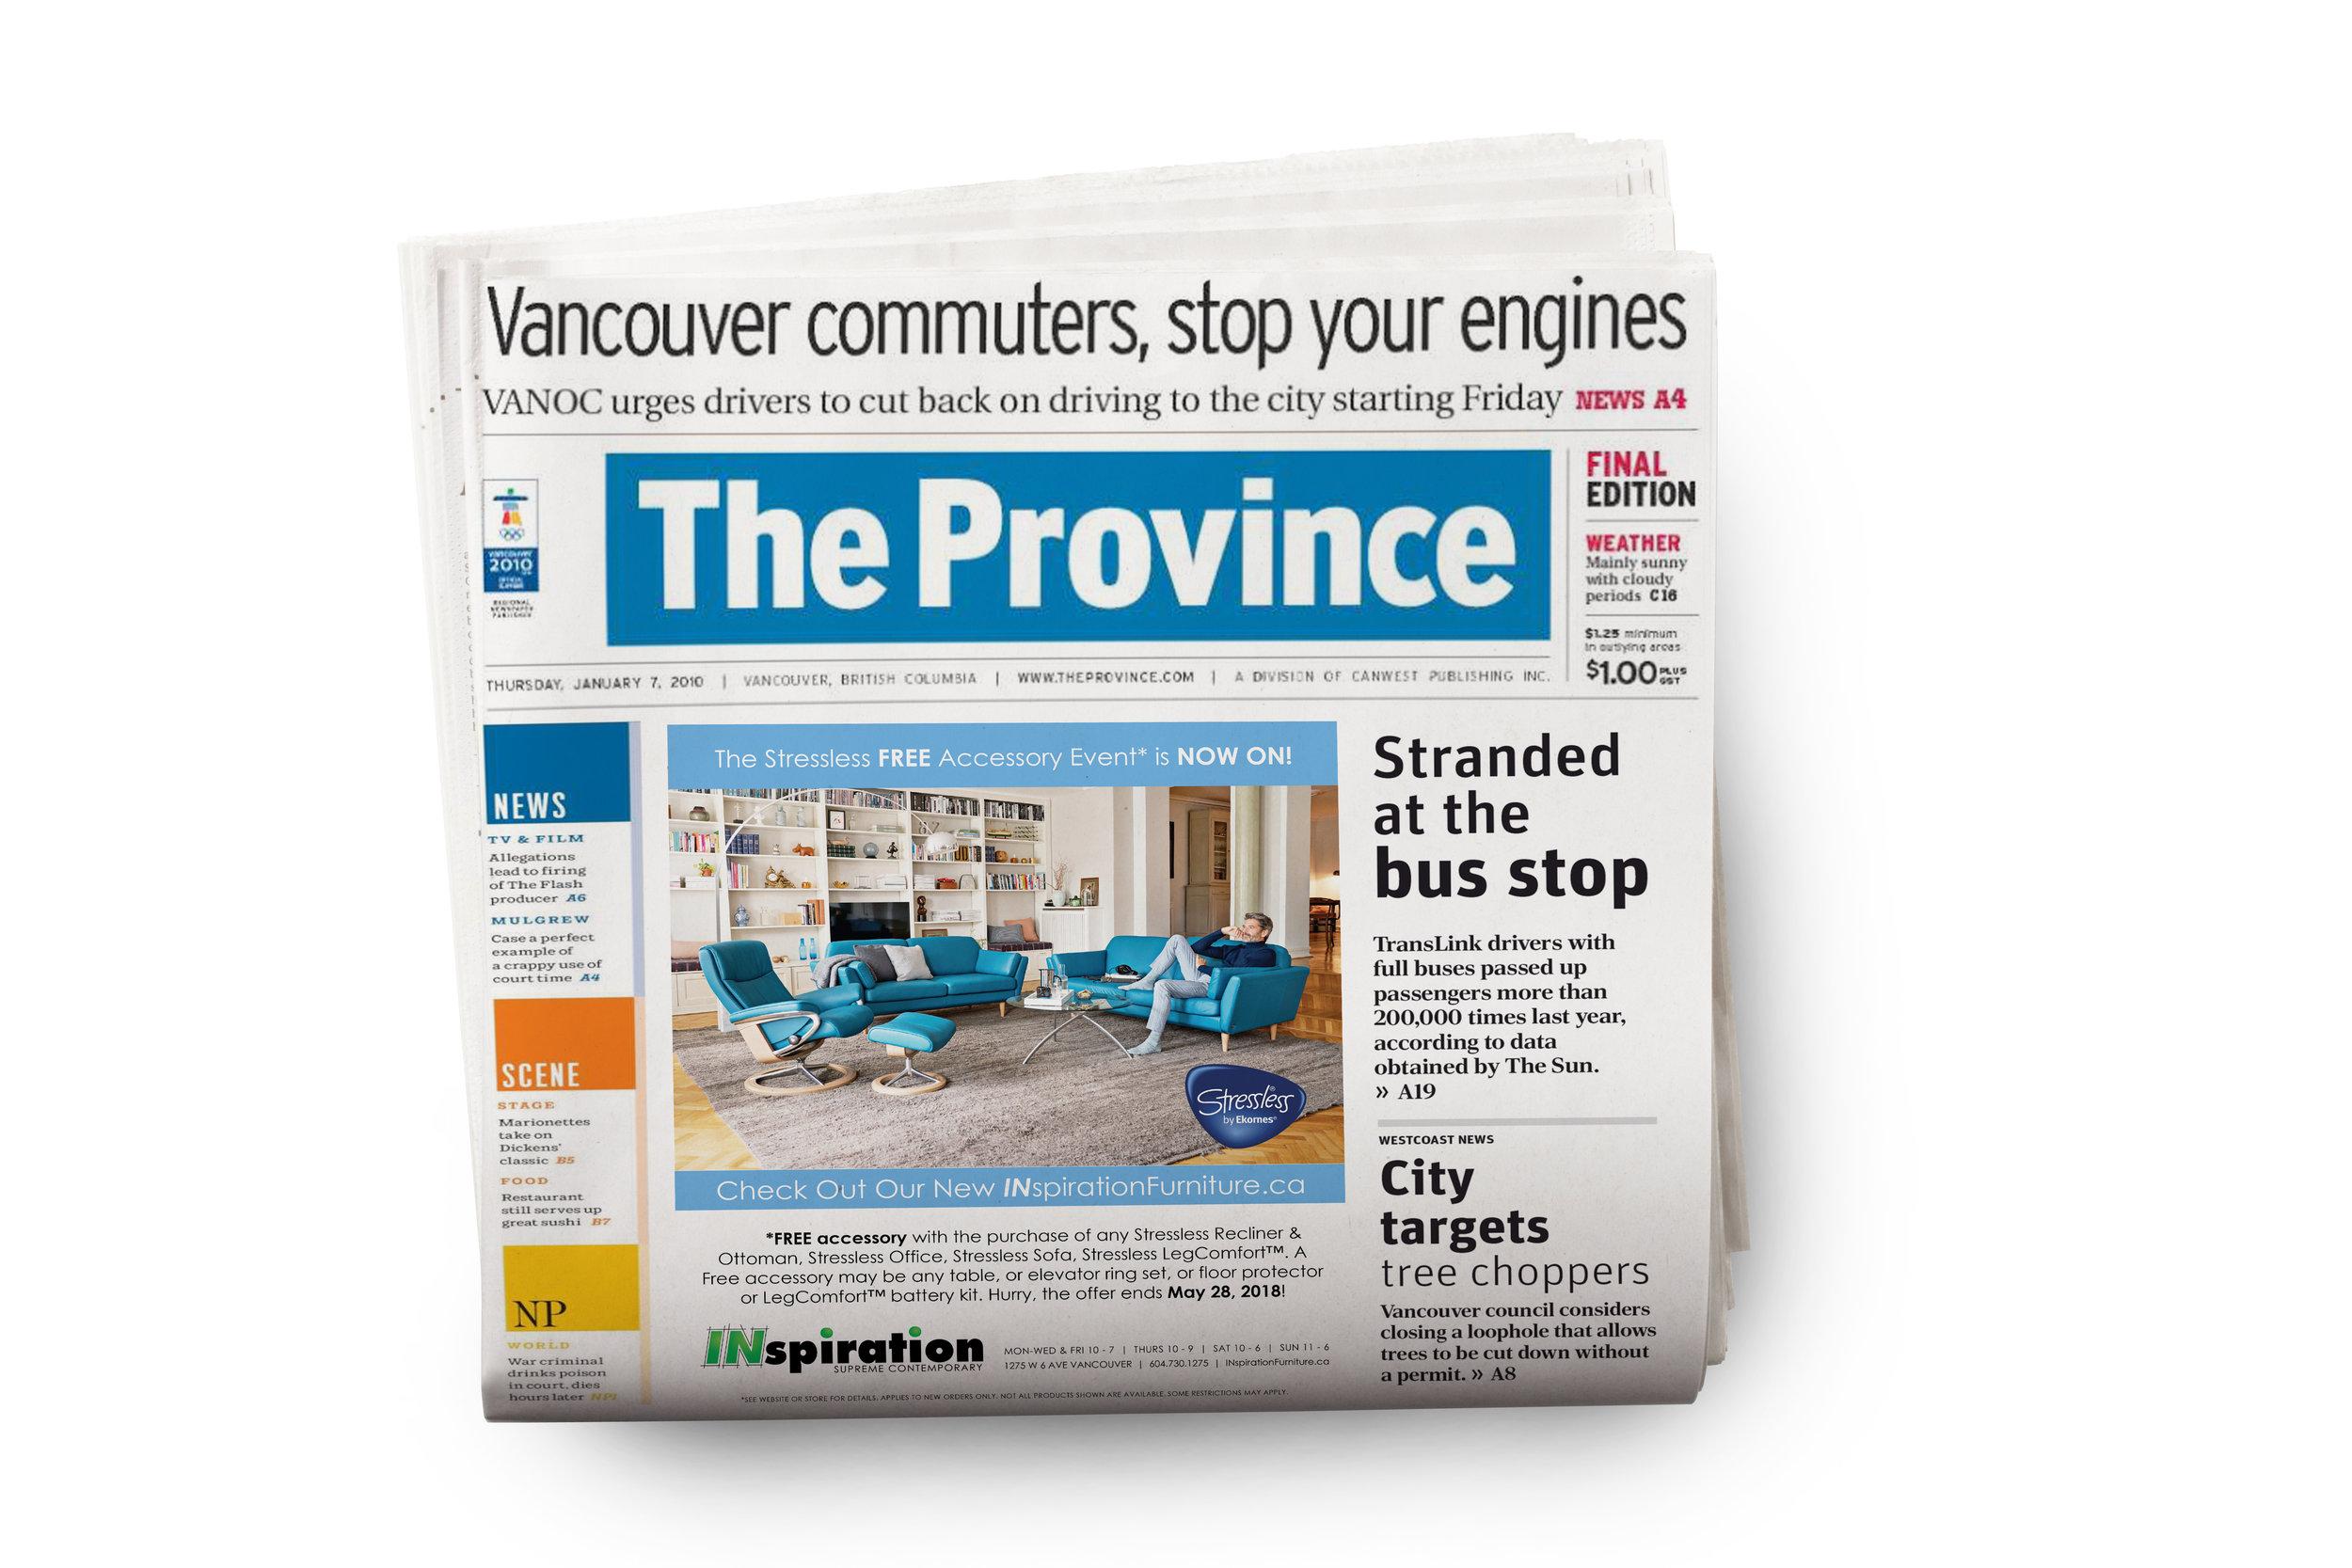 IN_Province_Newspaper10.jpg